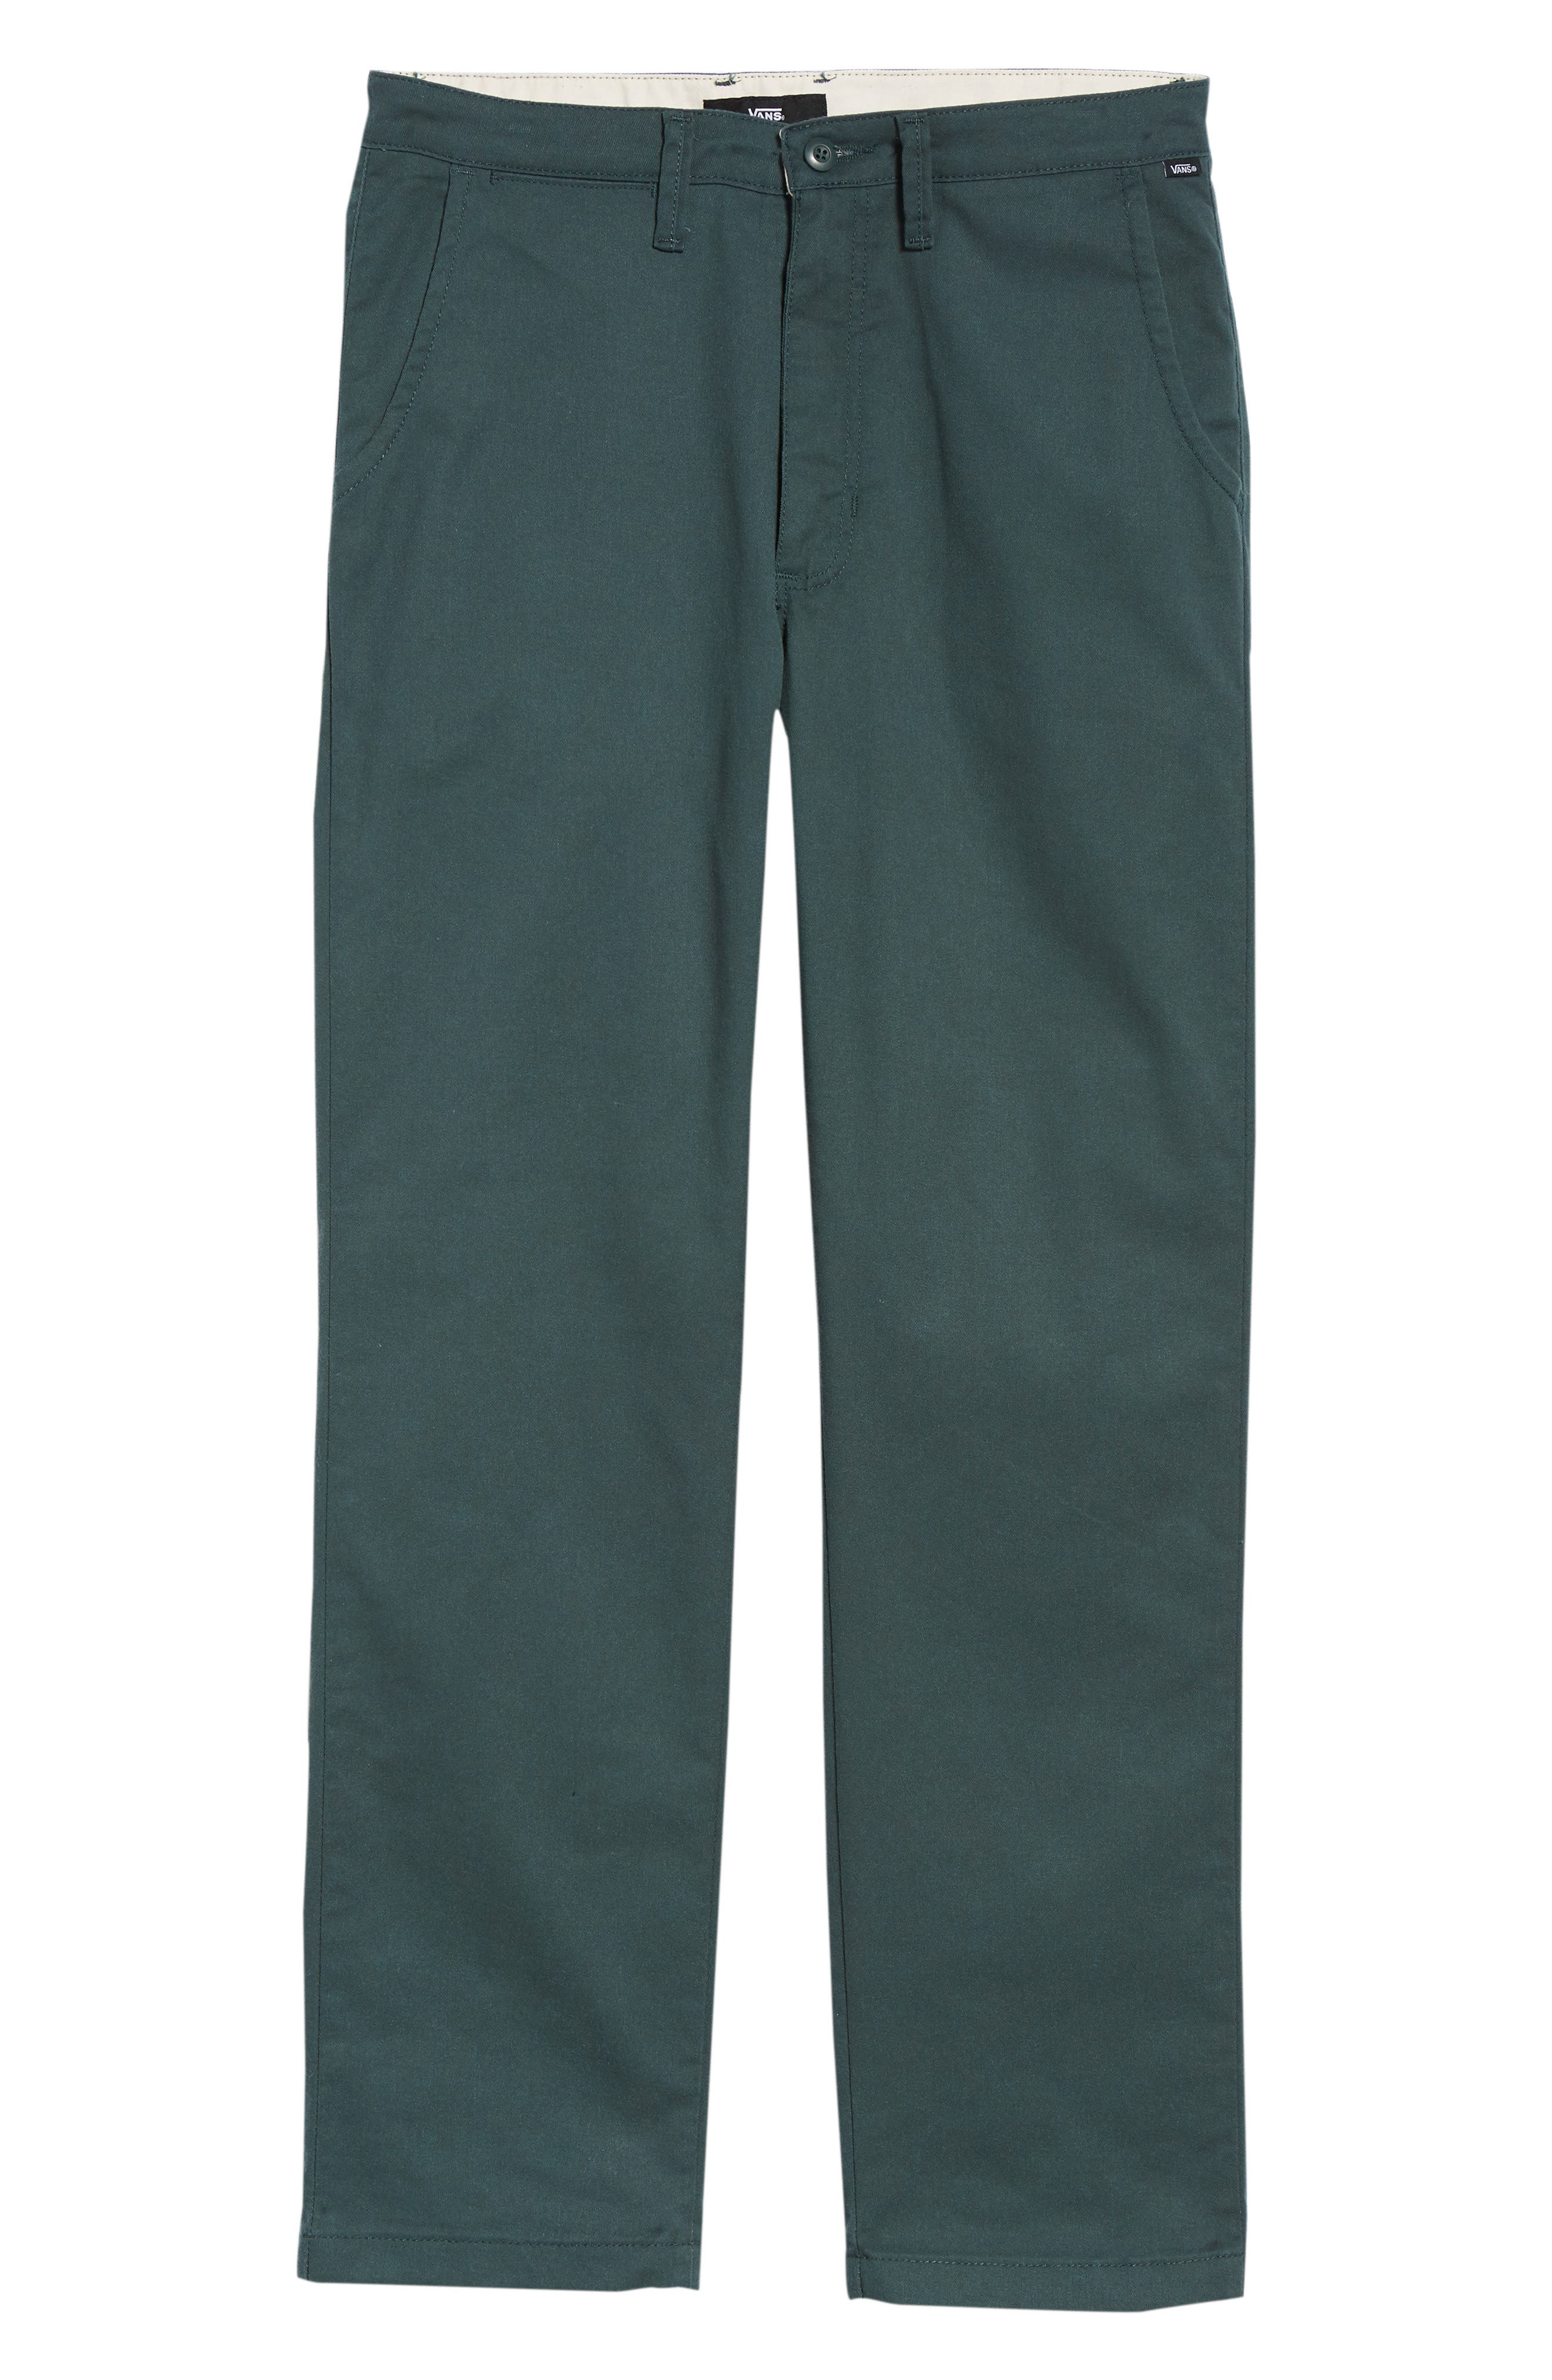 Authentic Chino Pro Pants,                             Alternate thumbnail 6, color,                             300